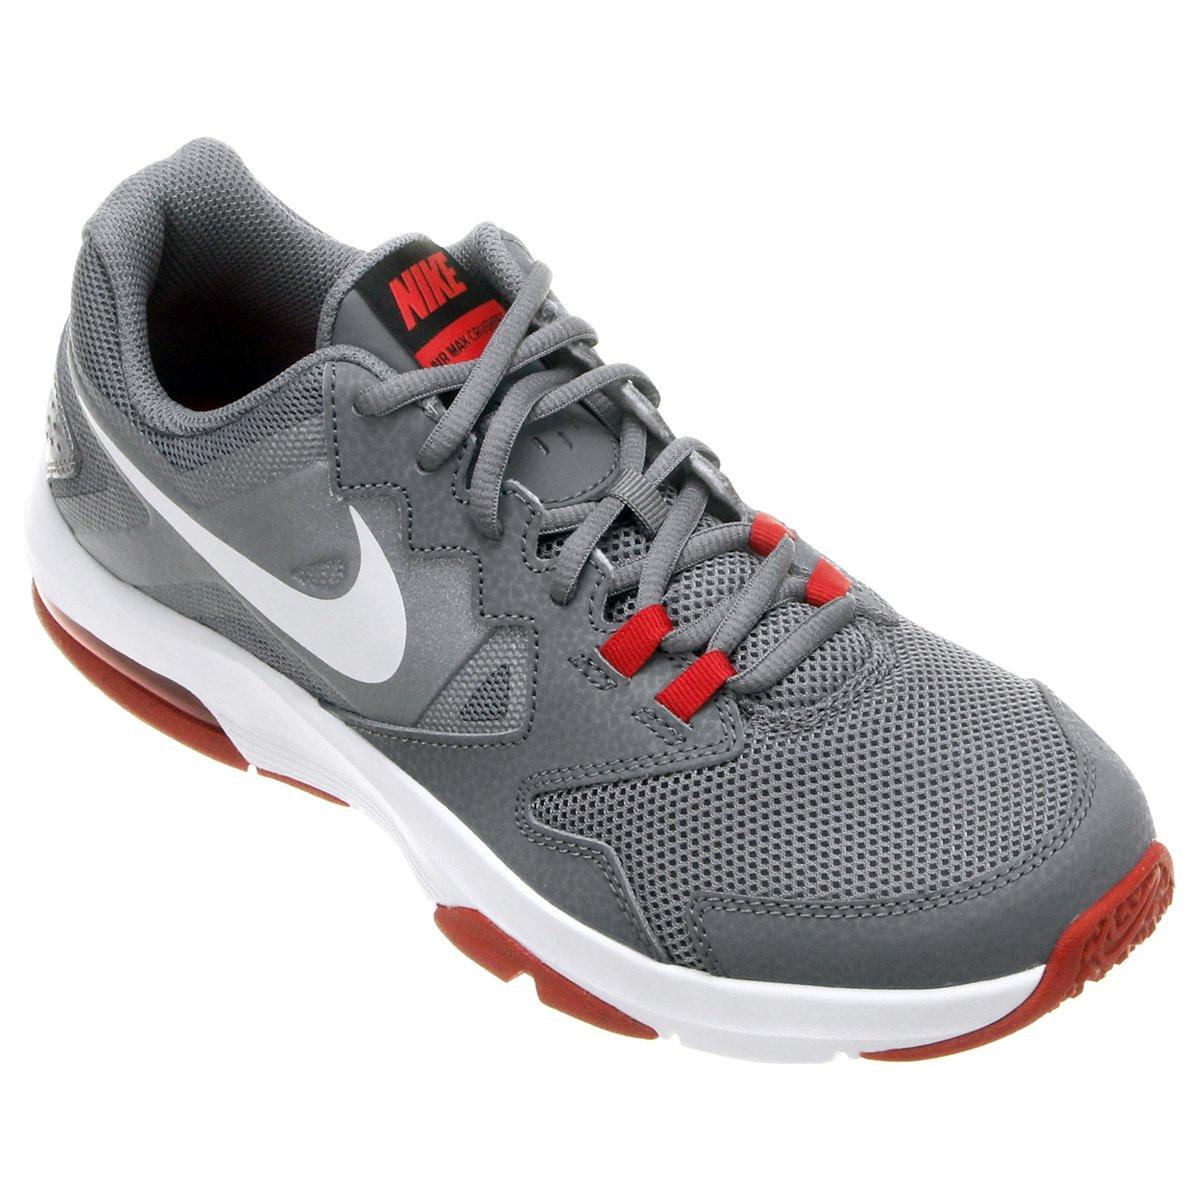 ad63a8cf722 Tênis Nike Air Max Crusher 2 - Compre Agora